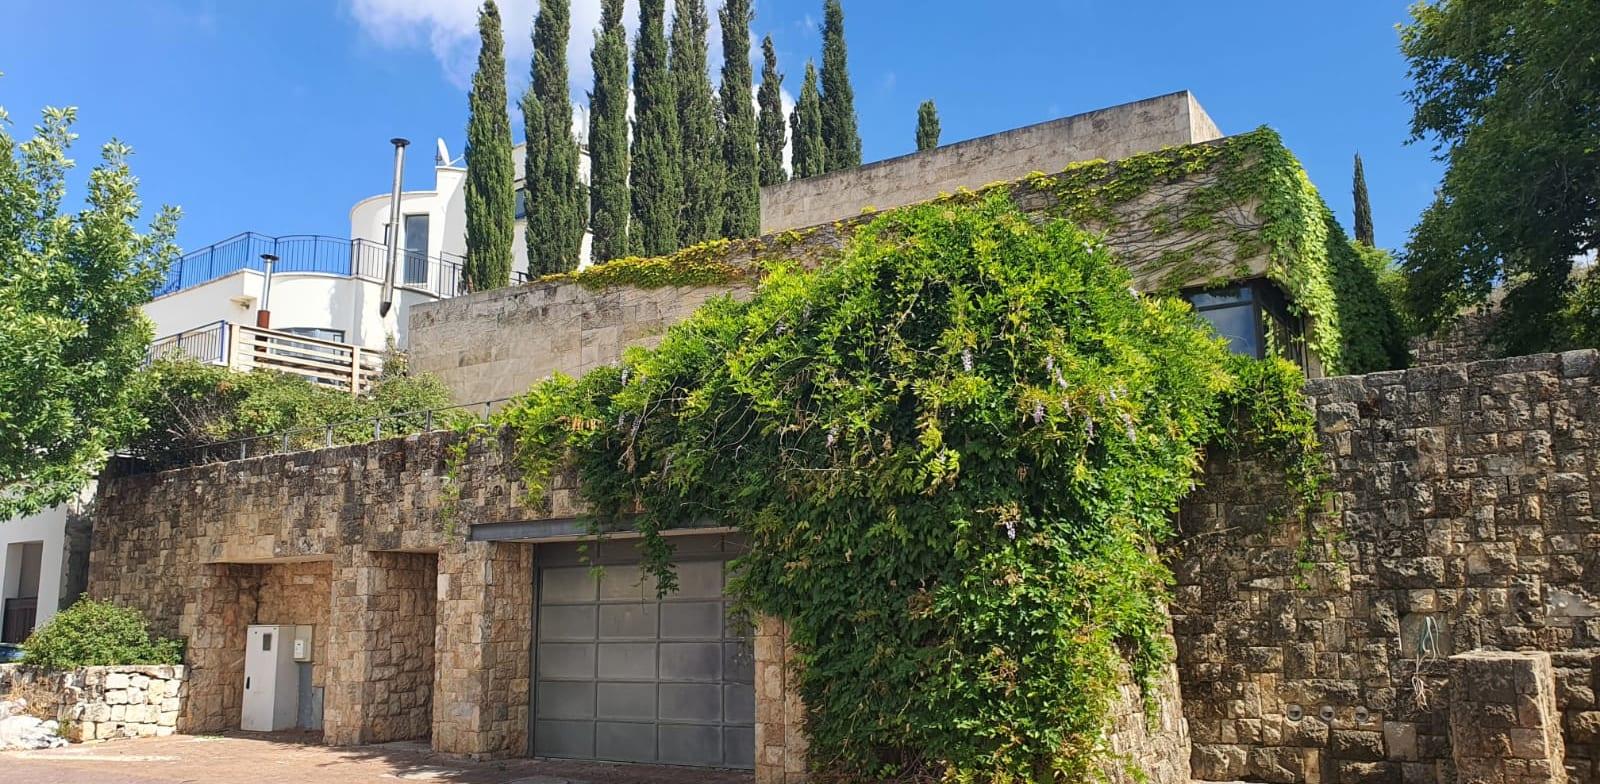 Wertheimer's Kfar Vradim house Photo: Paul Orleib